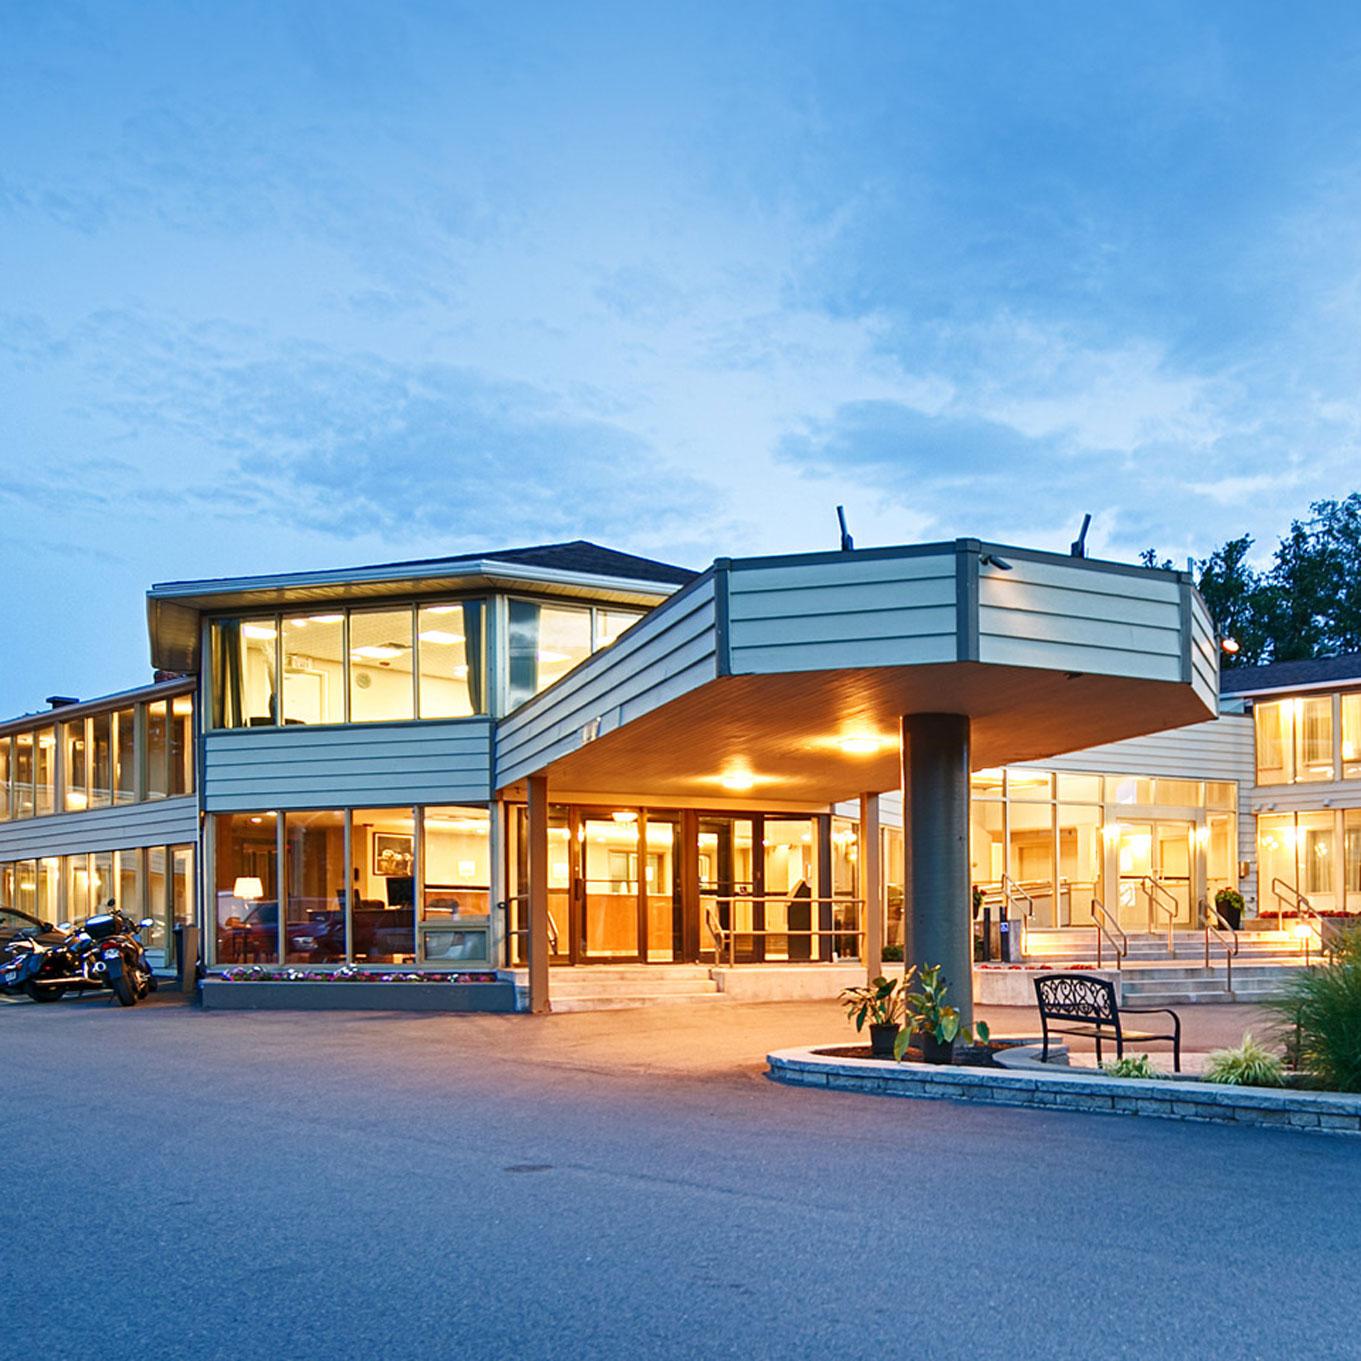 Charlottetown Inn & Conference Centre